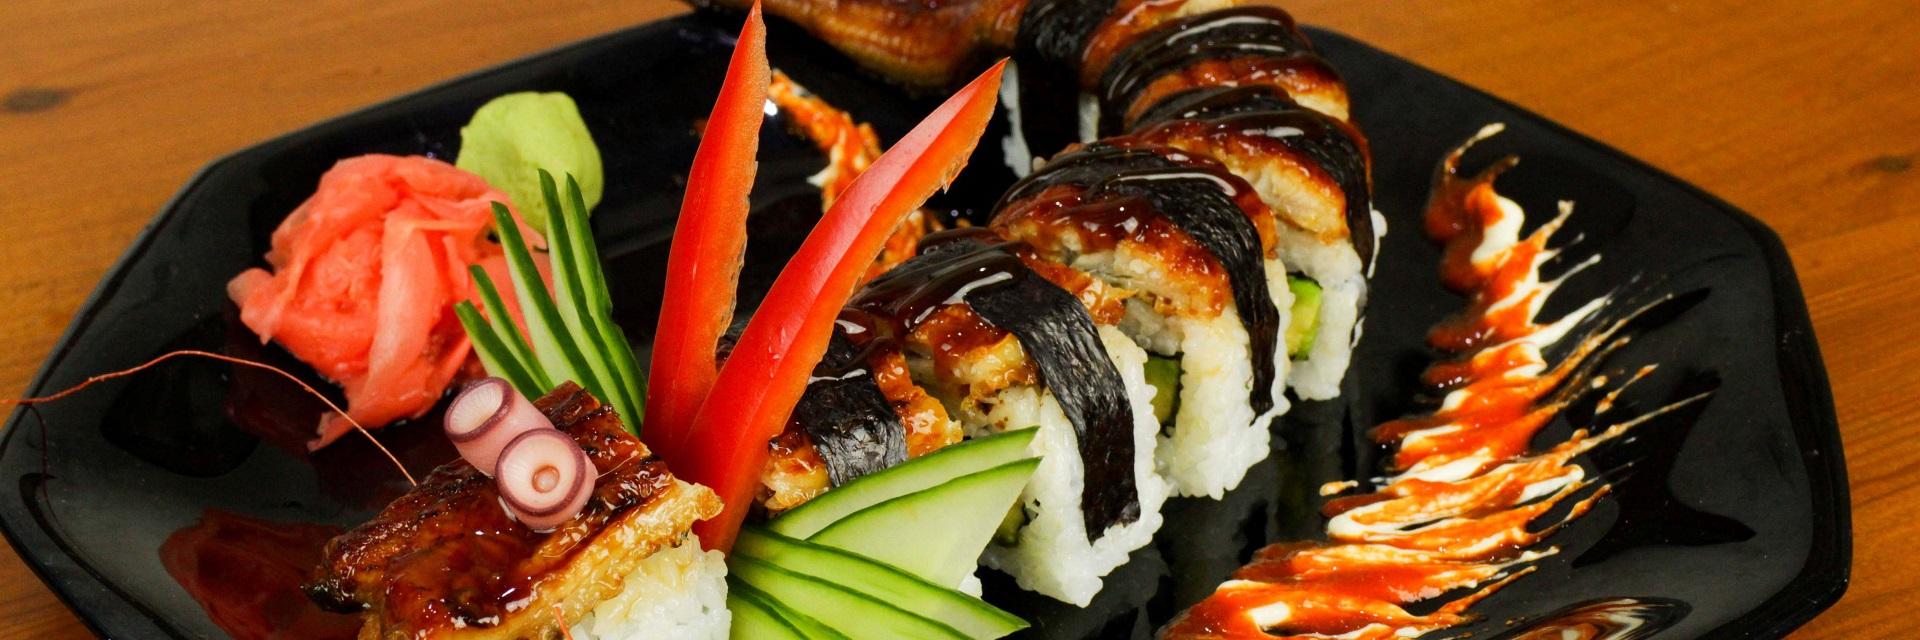 Sushi, Sushi Malang, Malang, Kota Malang, Dolan Dolen, Dolaners Sushi - Dolan Dolen